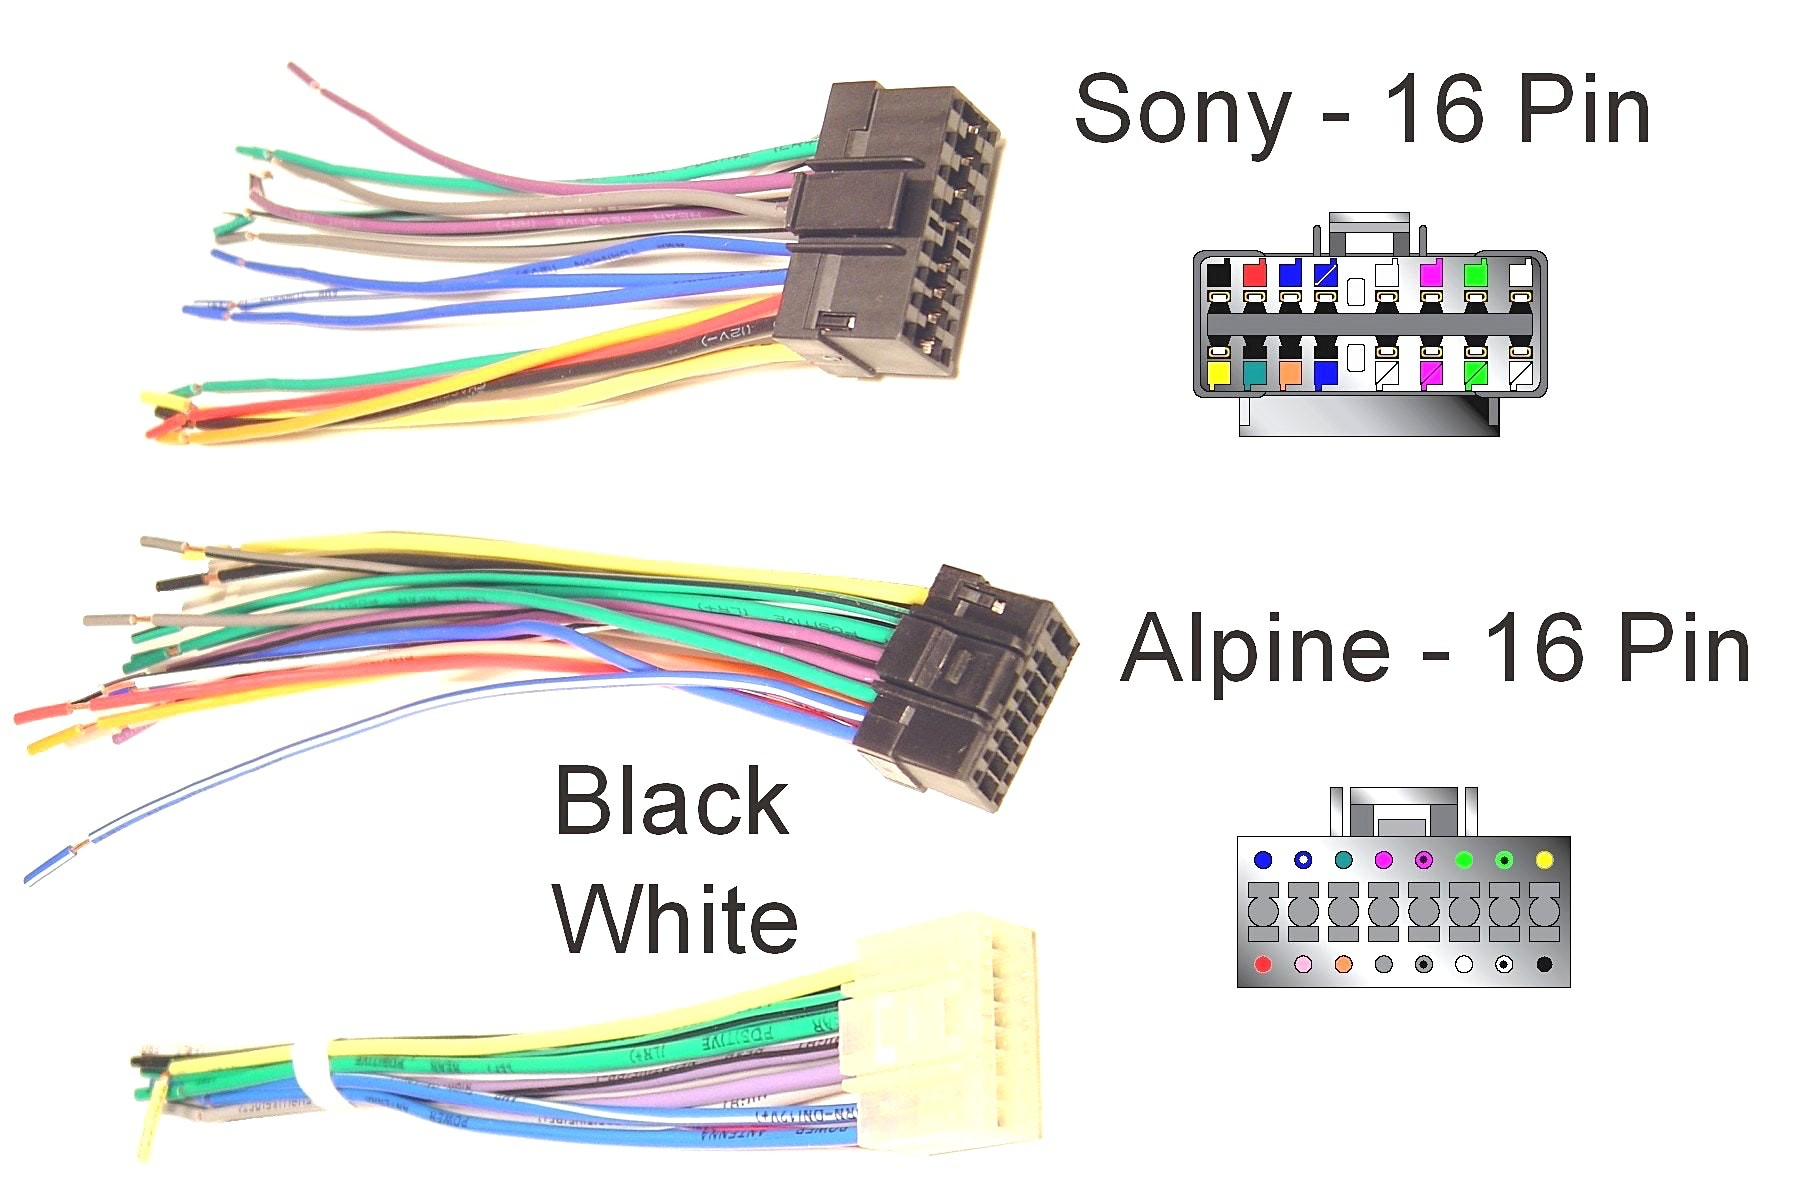 Sony Car Cd Player Wiring Diagram | Wiring Diagram - Sony Xplod Car Stereo Wiring Diagram